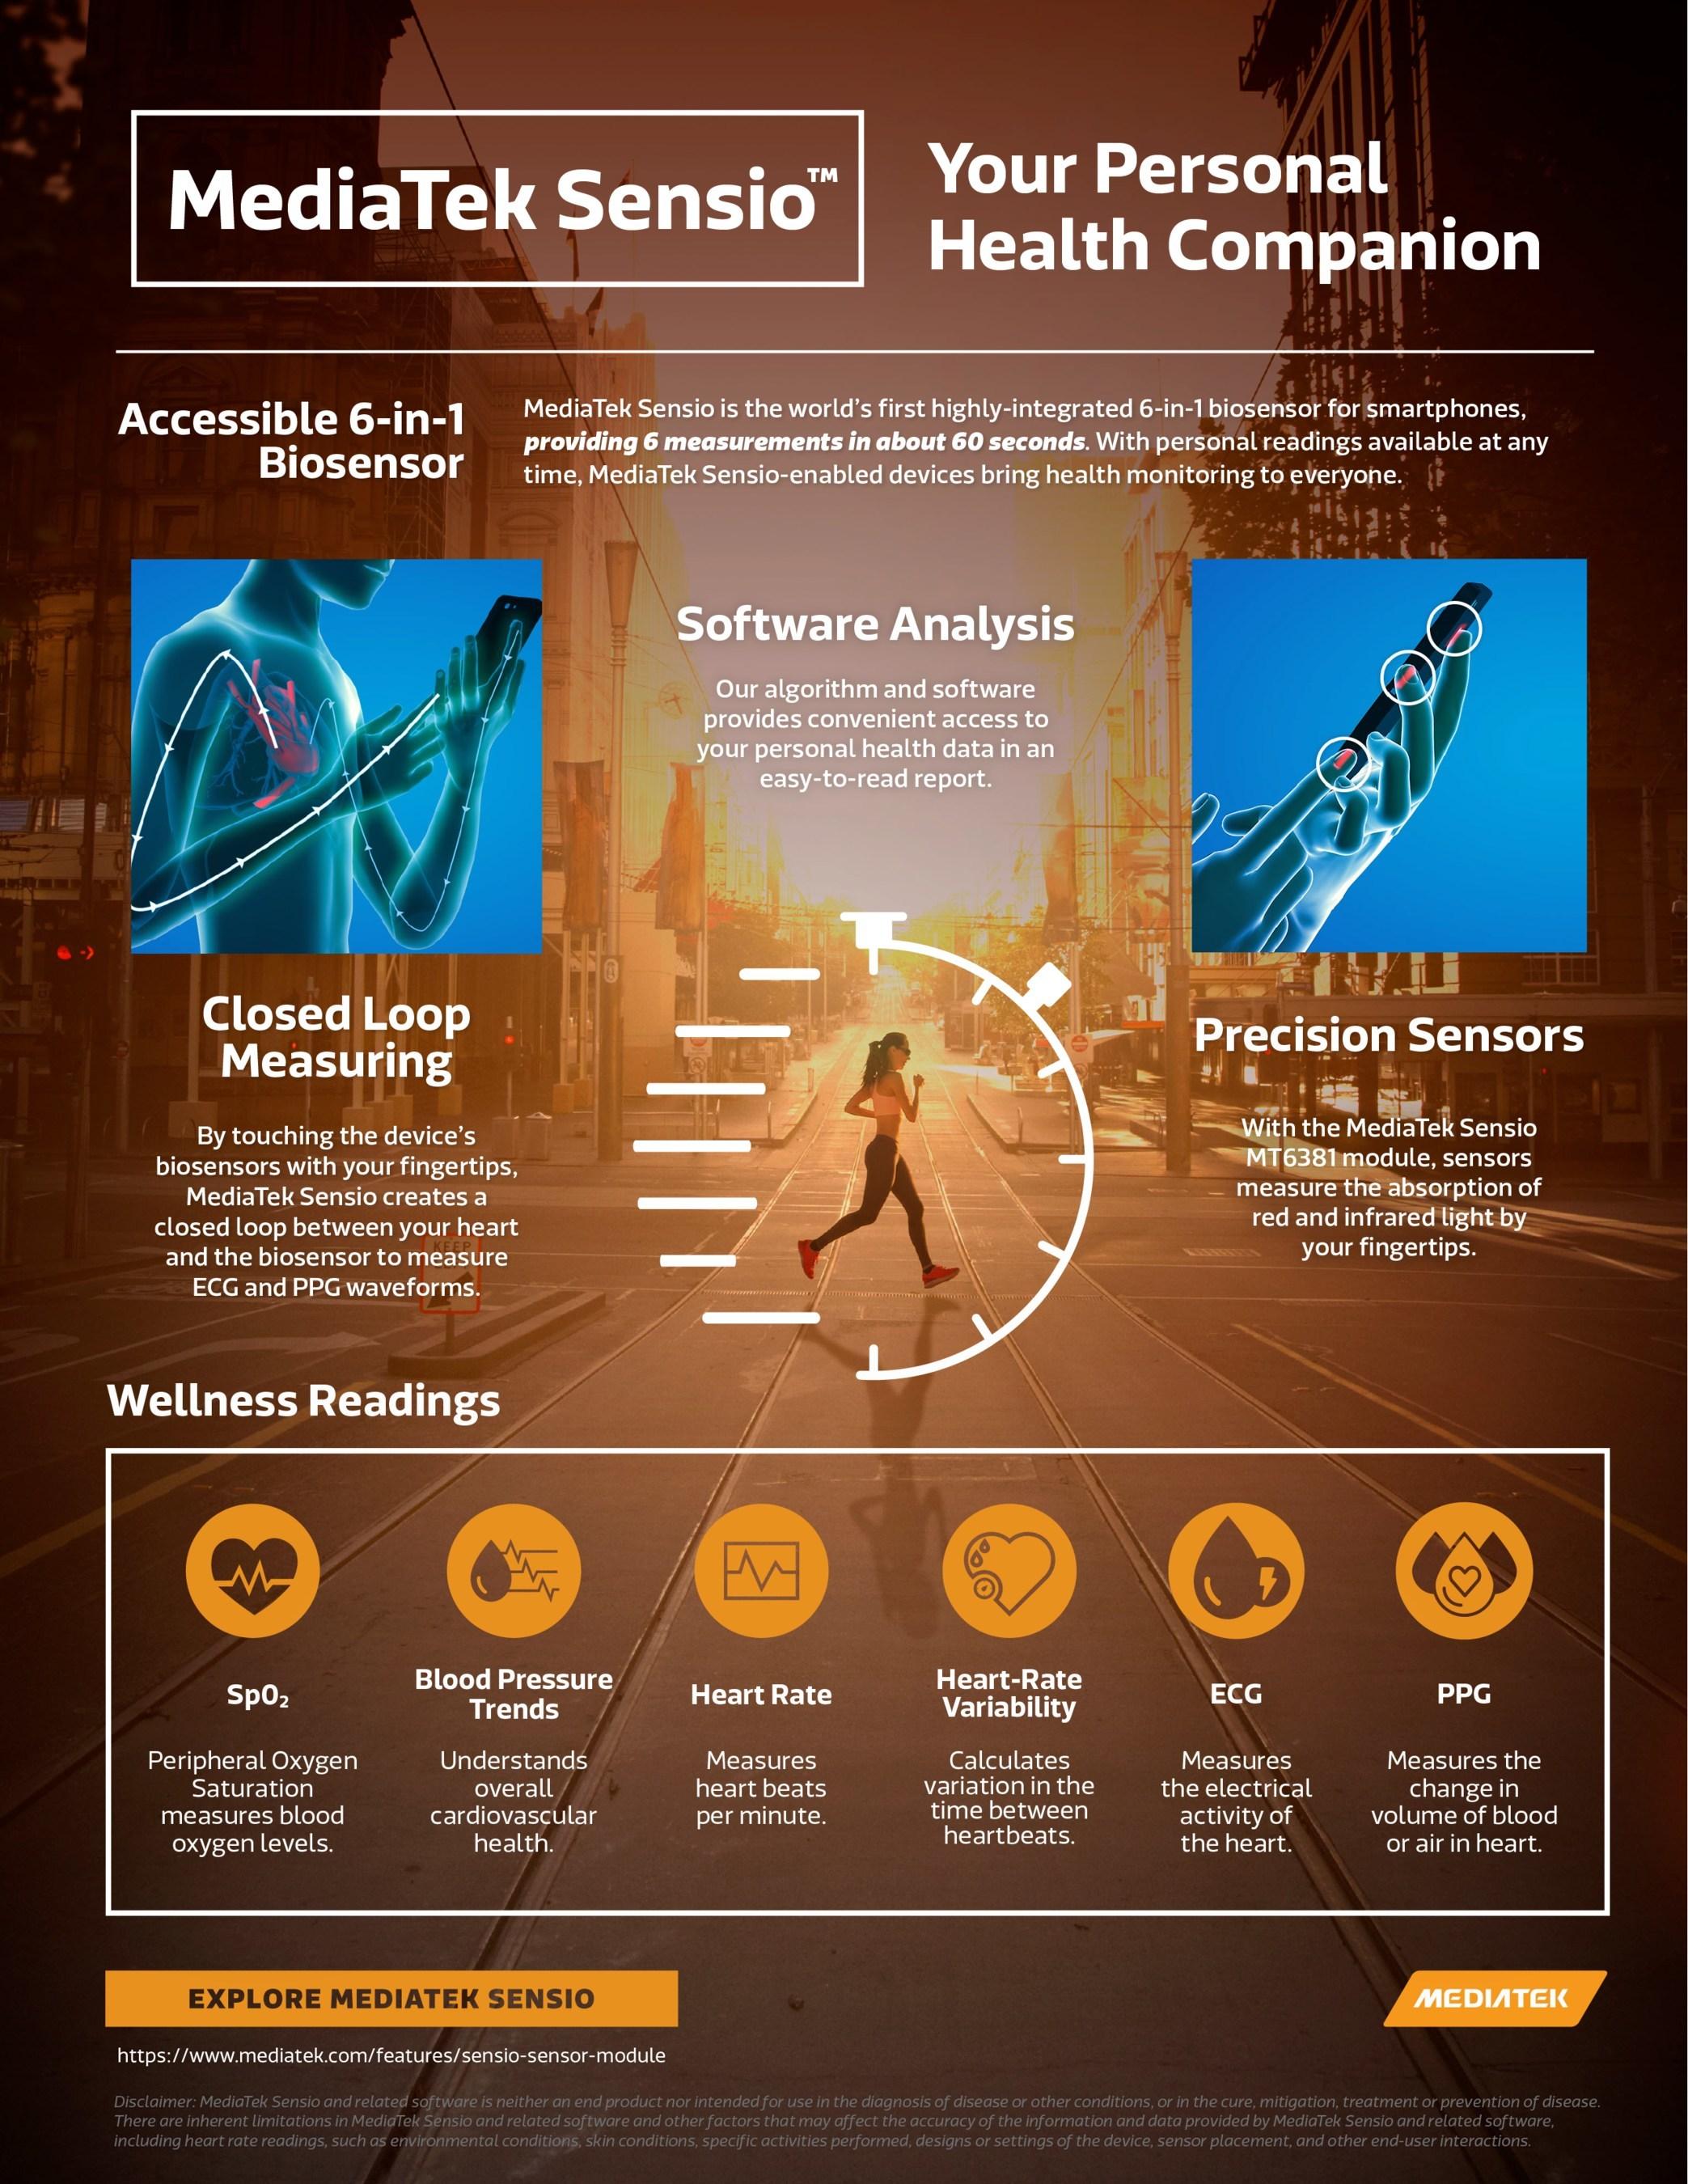 MediaTek Sensio biosensor module for smartphones